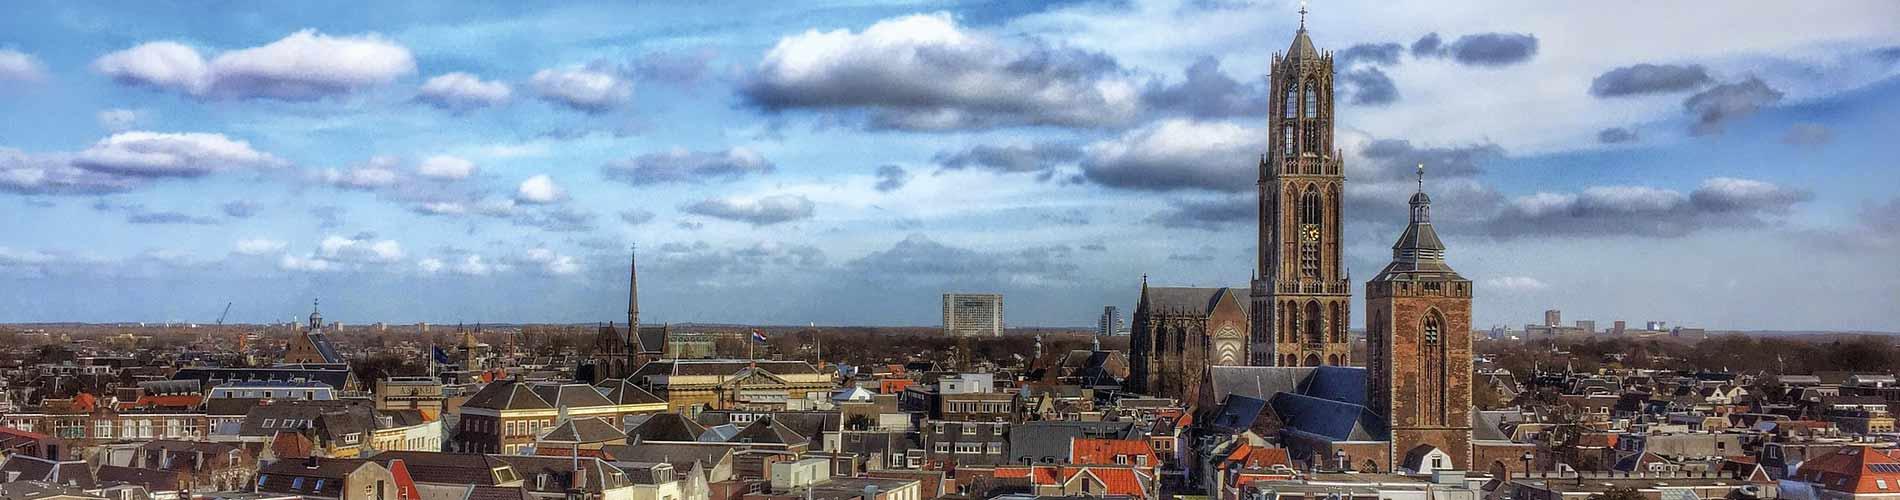 Blog_SoloTravel_VDay_Utrecht_1900x500_Q120